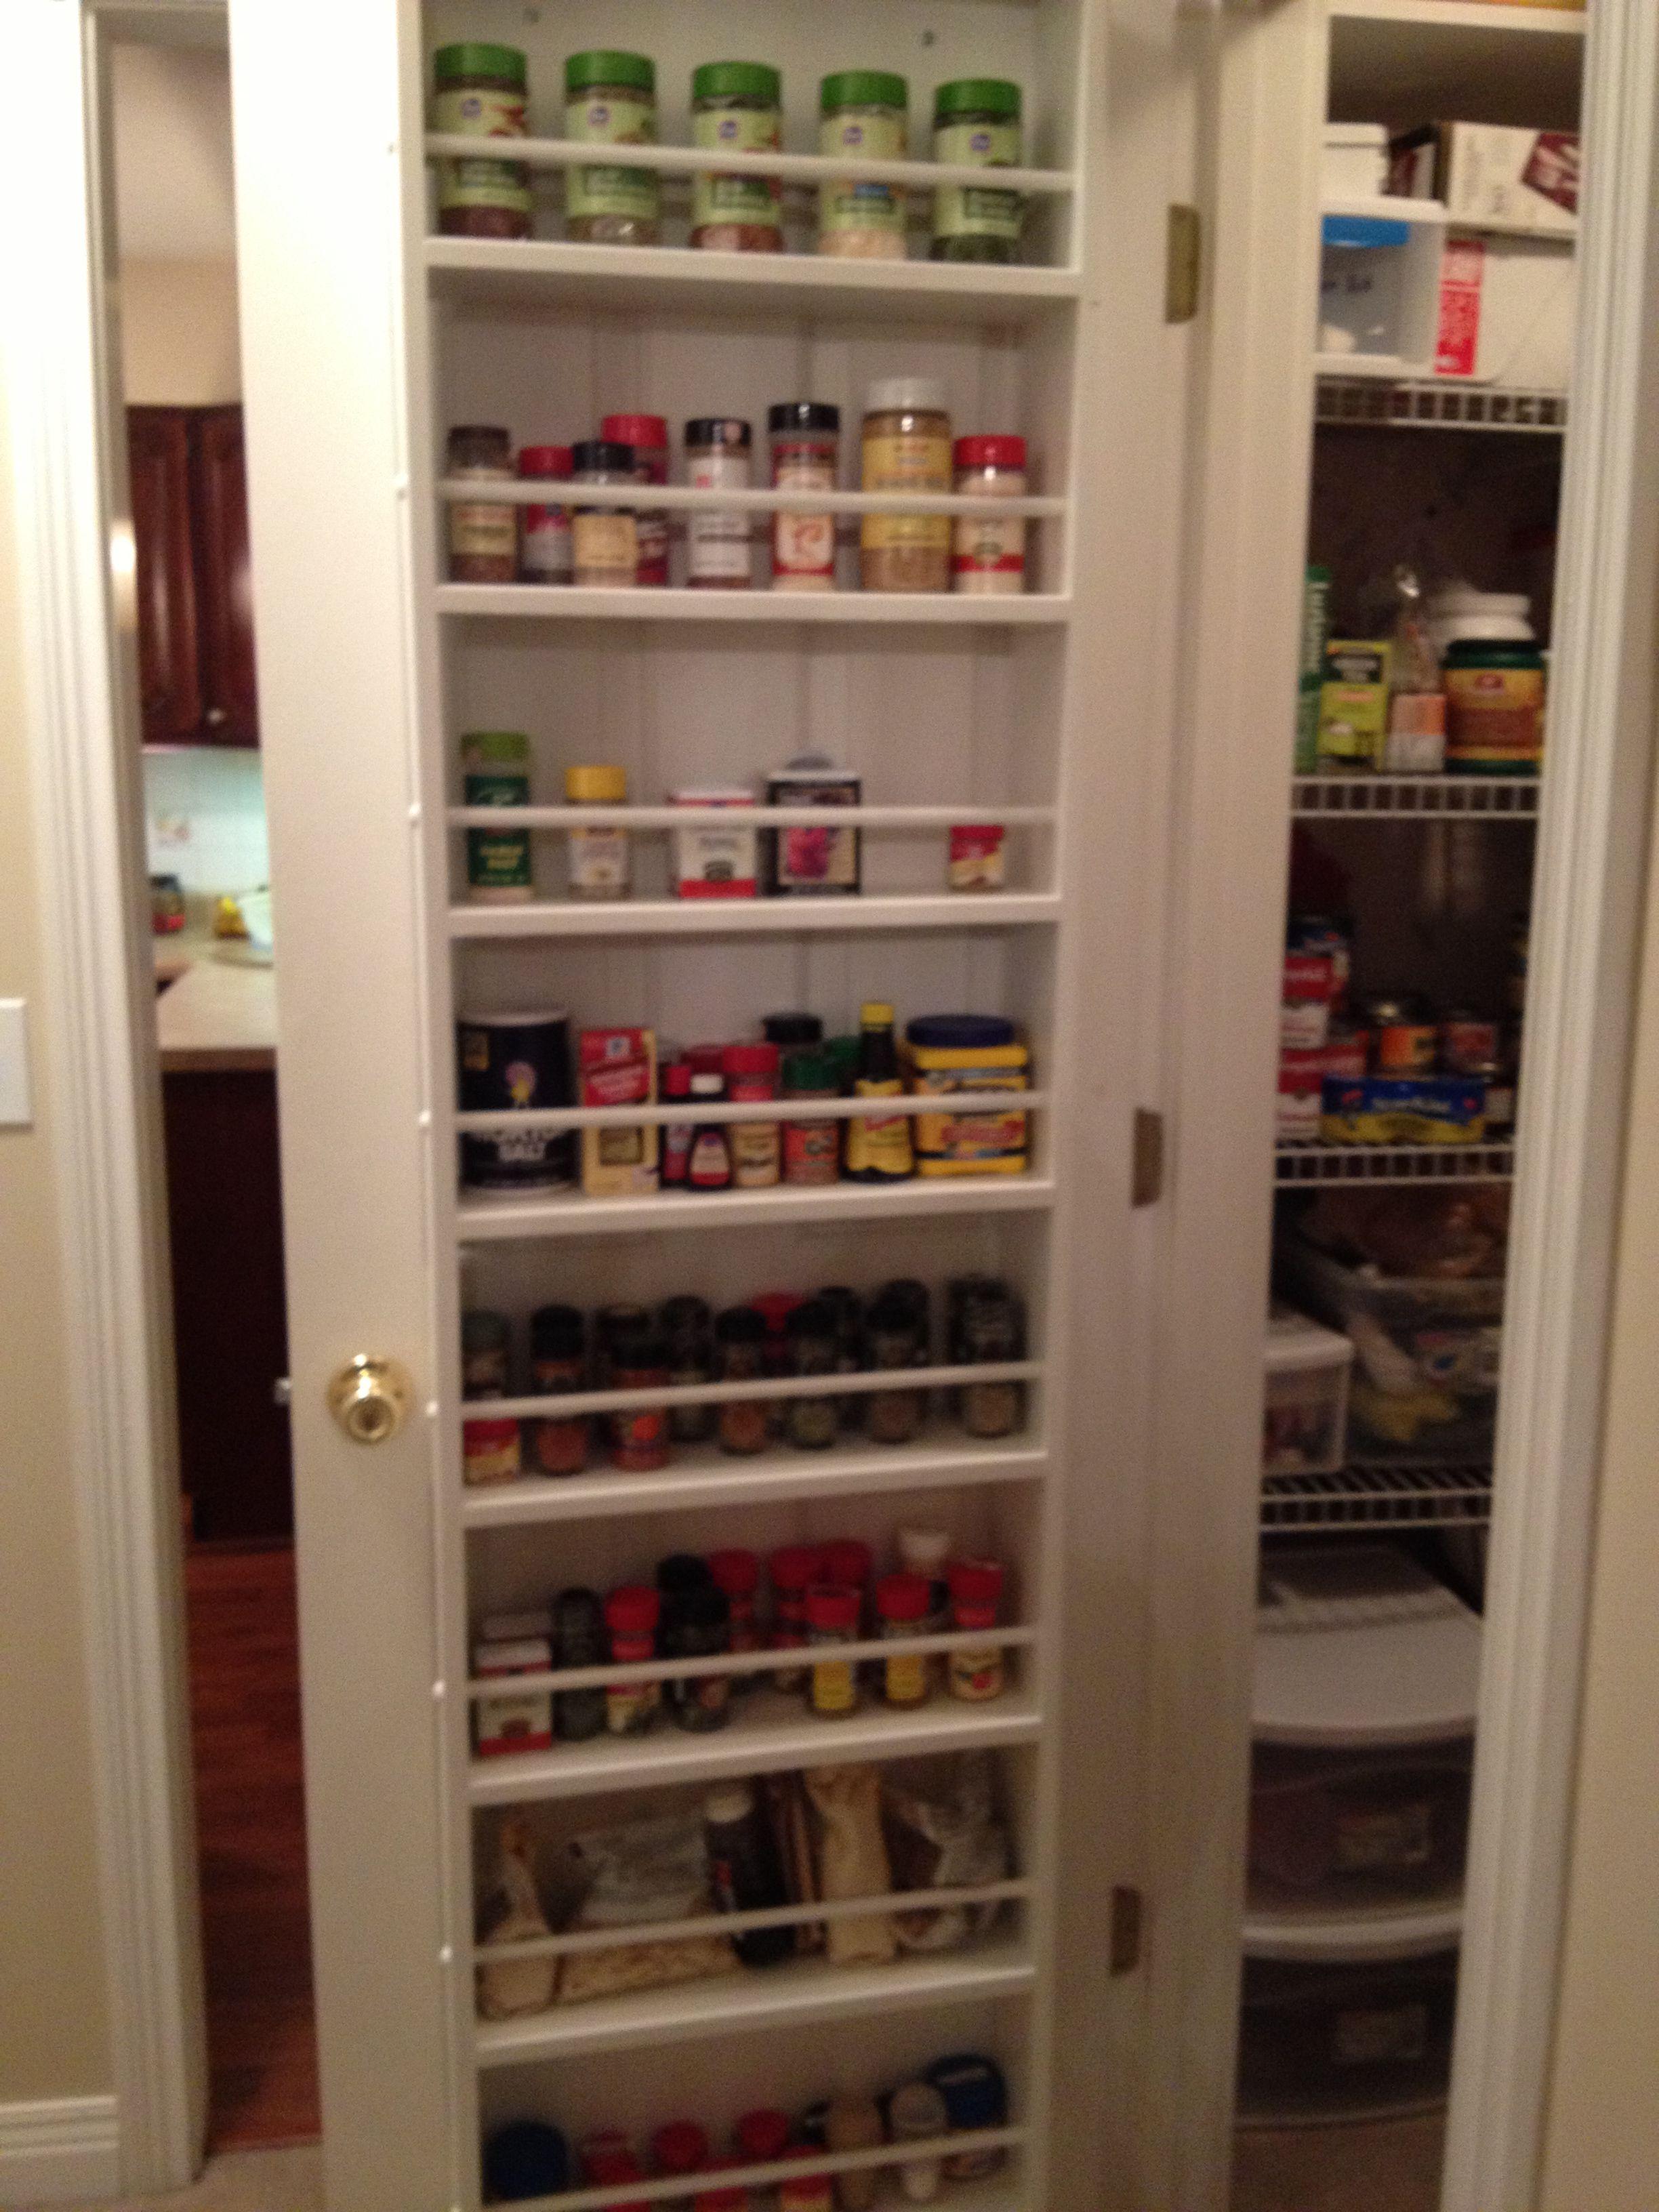 Behind The Pantry Door Spice Rack